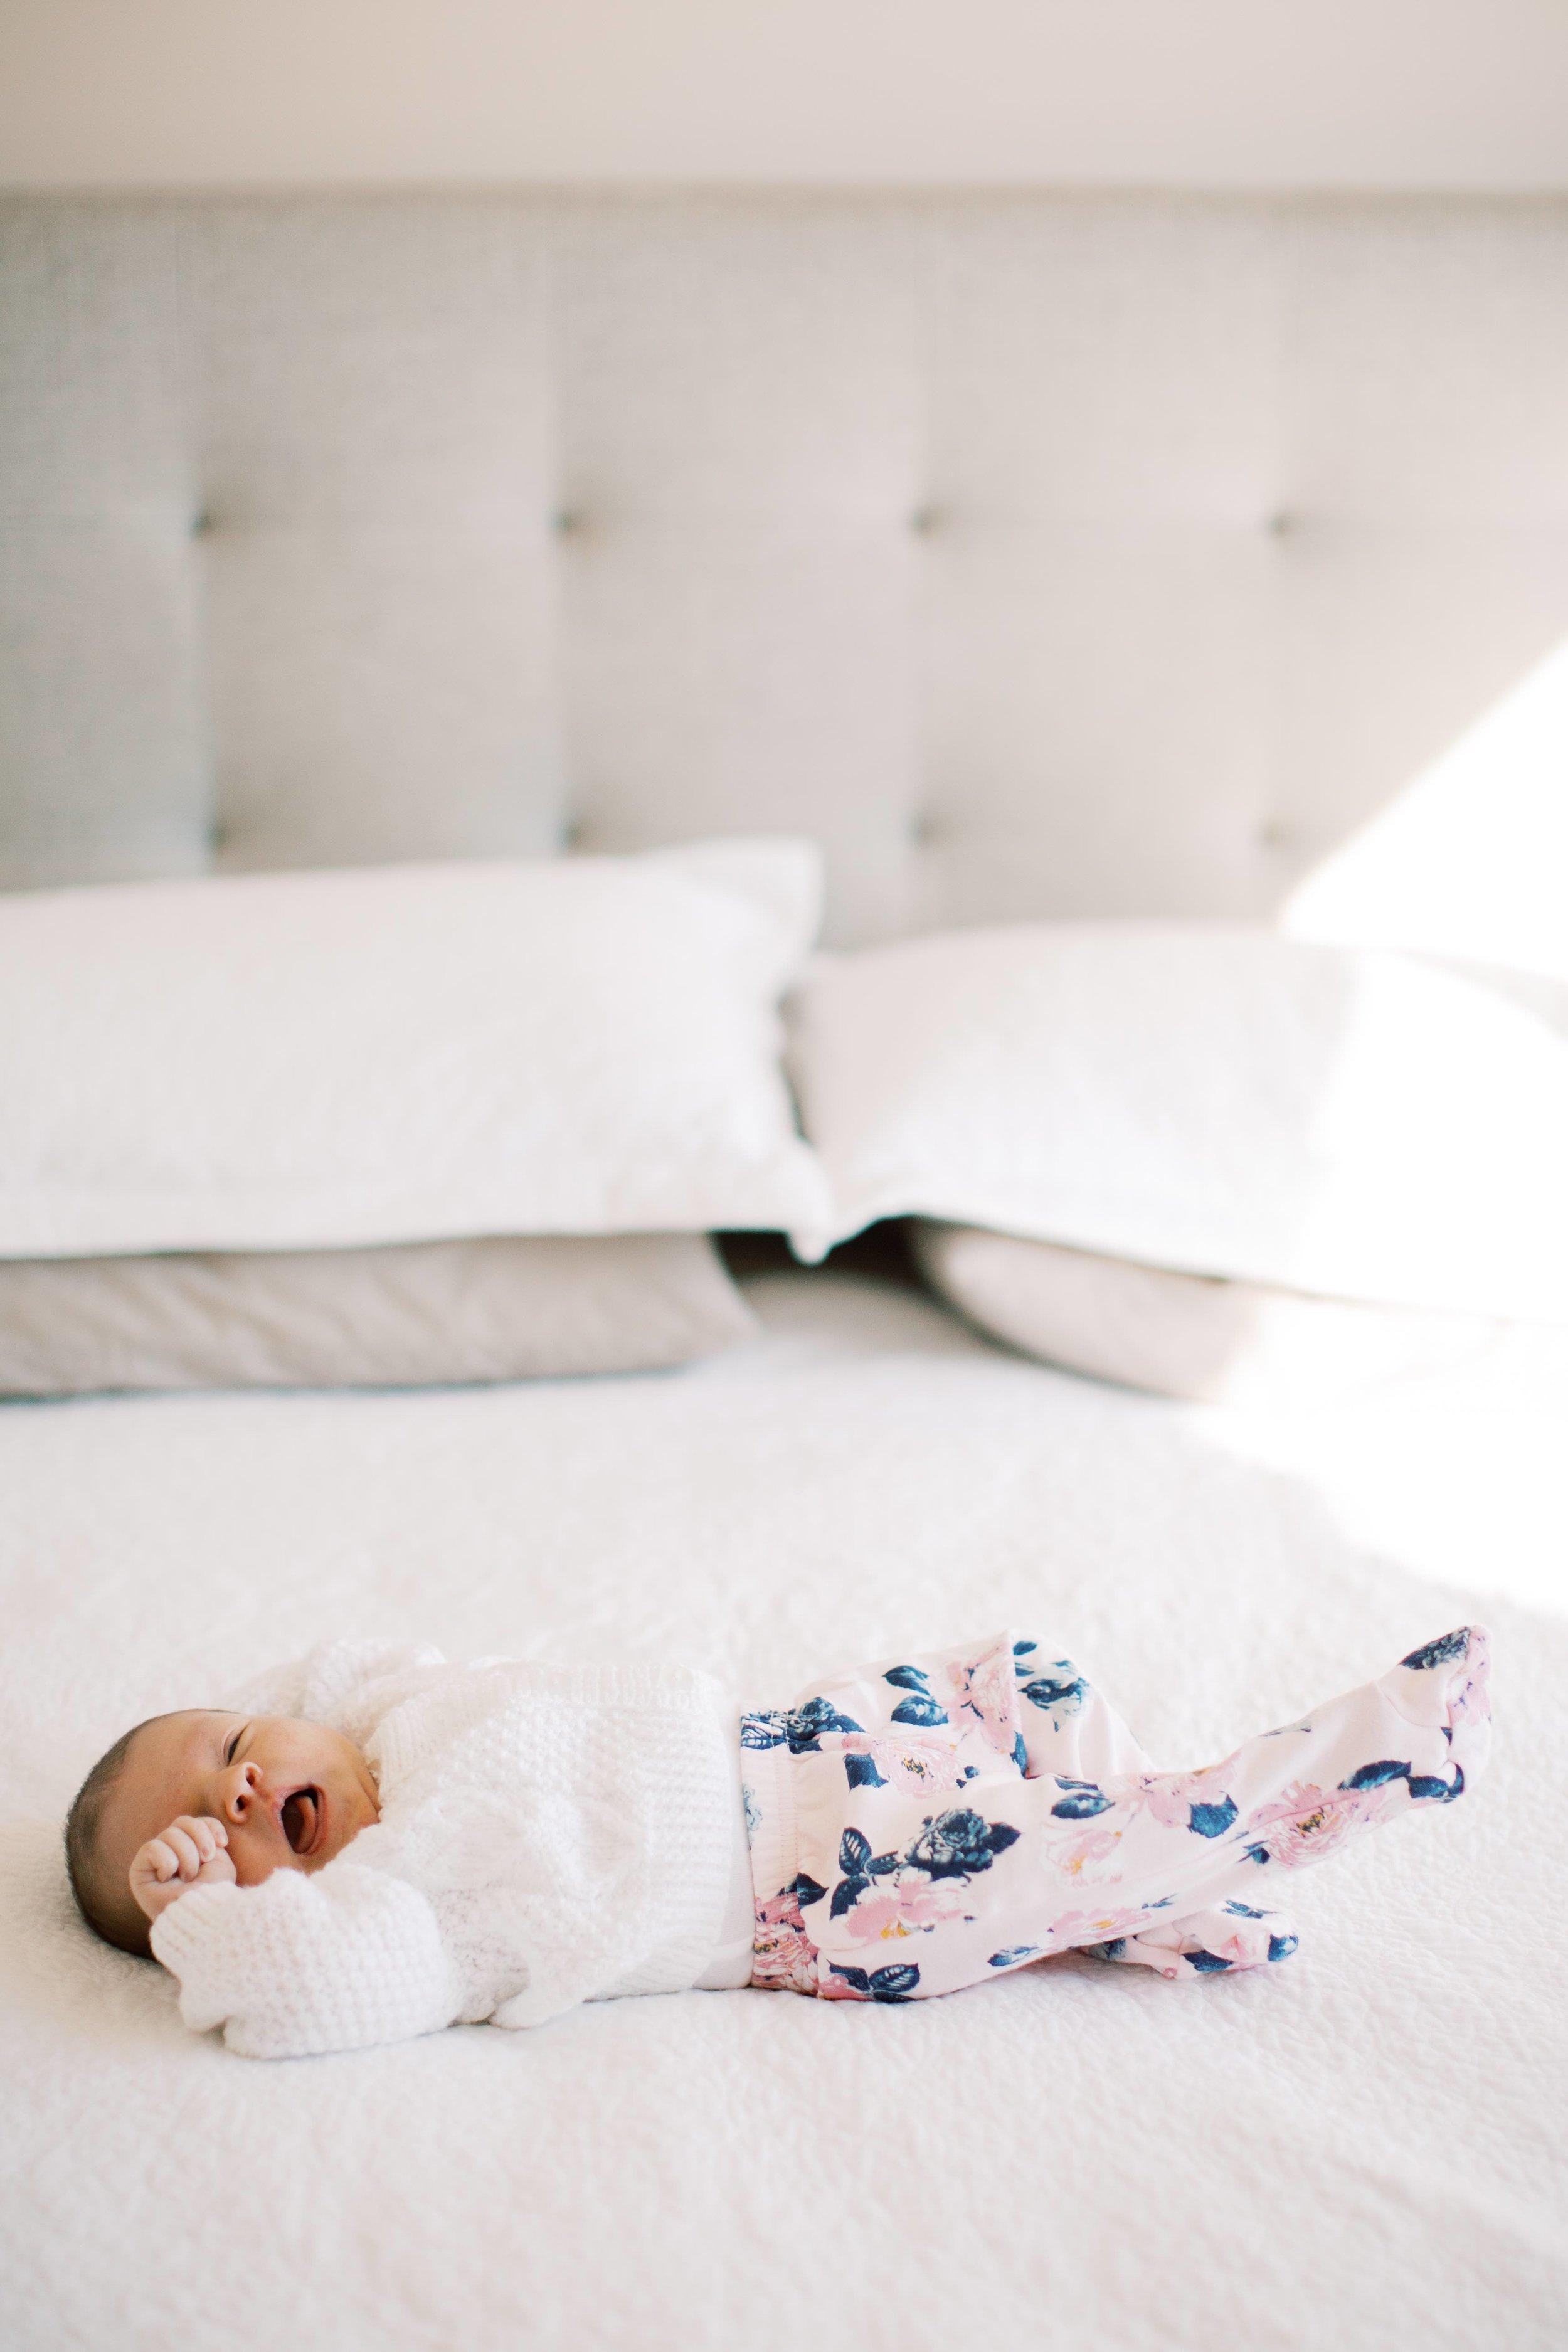 AmeliaClairePhotography_Mia_Newborn-1-75.jpeg